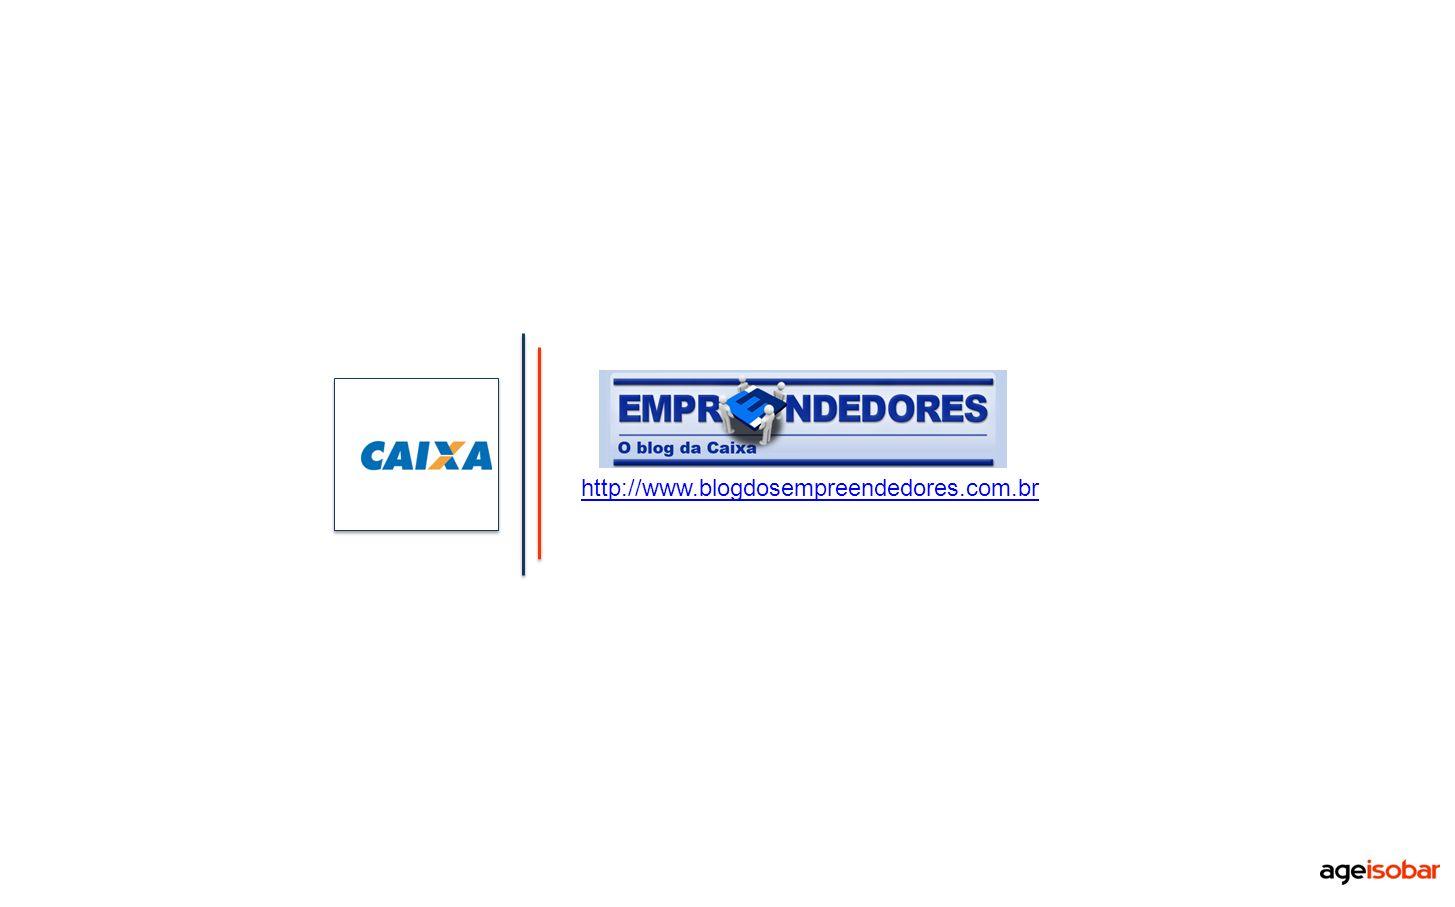 http://www.blogdosempreendedores.com.br